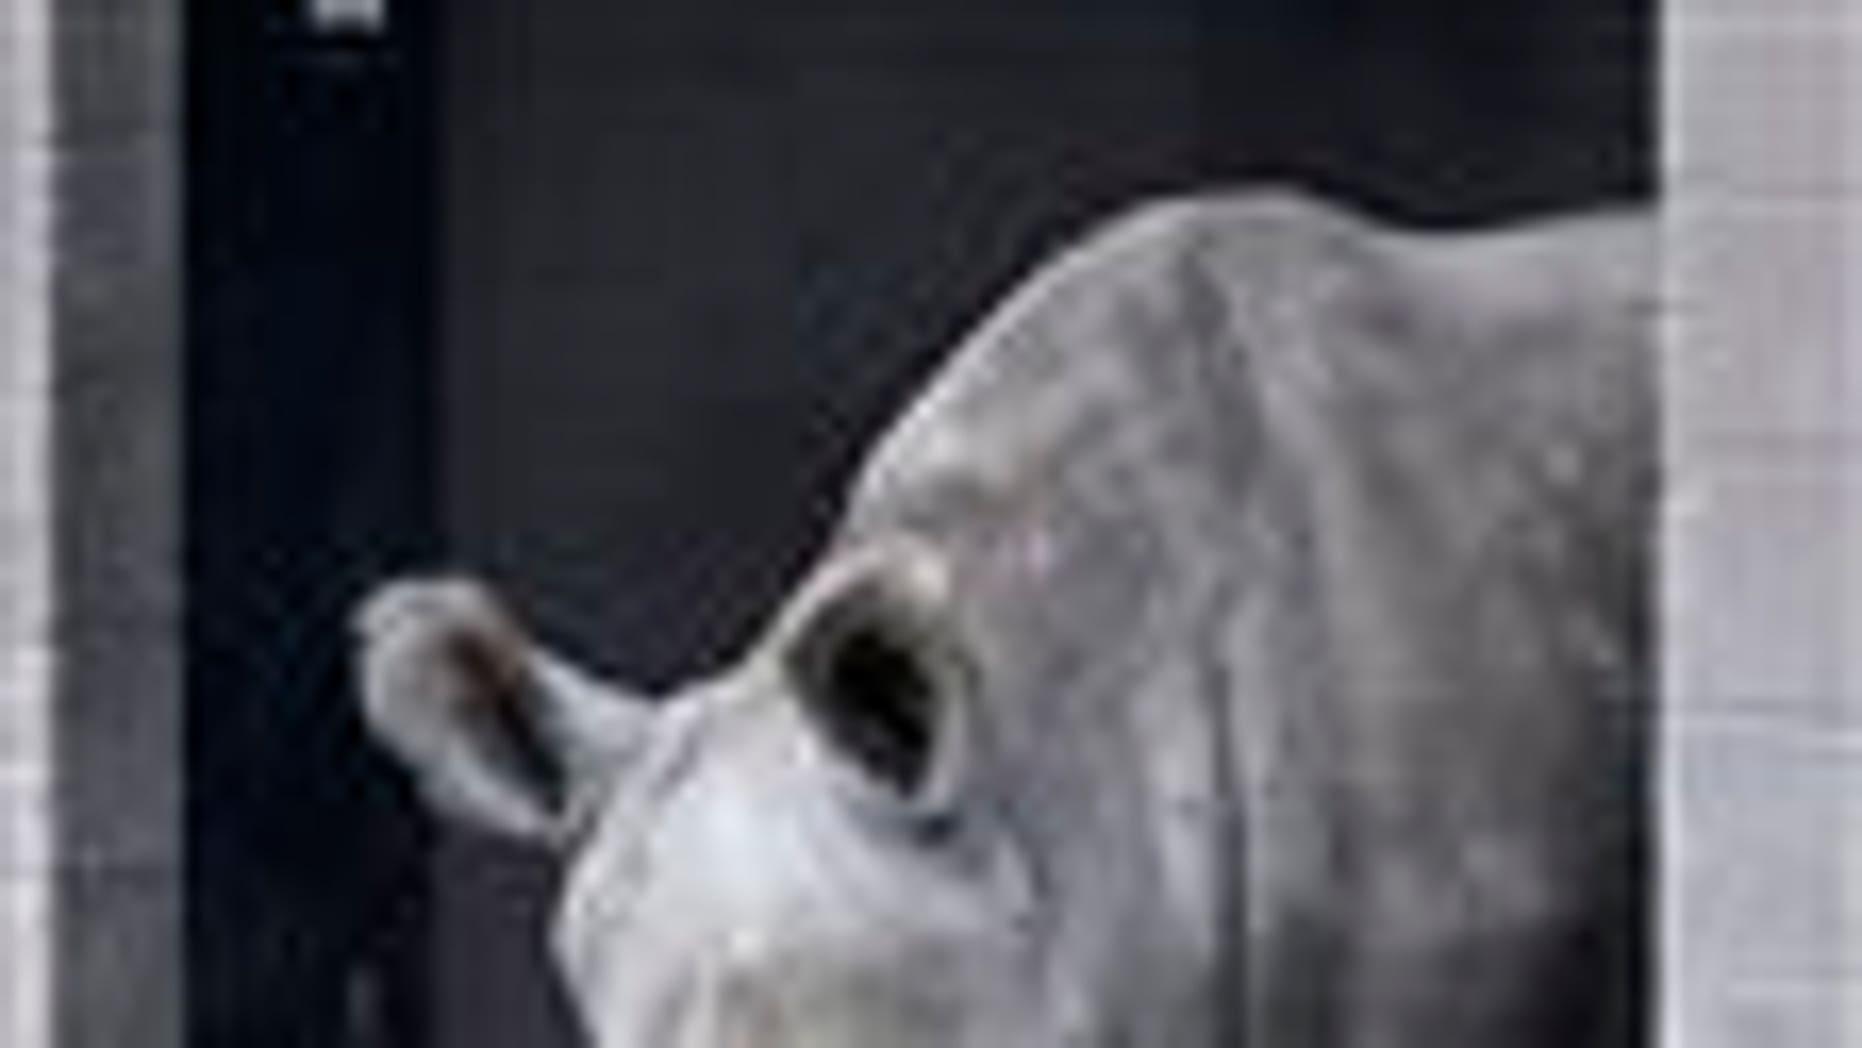 This Dec. 31, 2014, file photo shows Nola, a northern white rhinoceros, in her enclosure at the San Diego Zoo Safari Park in Escondido, Calif. (AP Photo/Lenny Ignelzi, File)